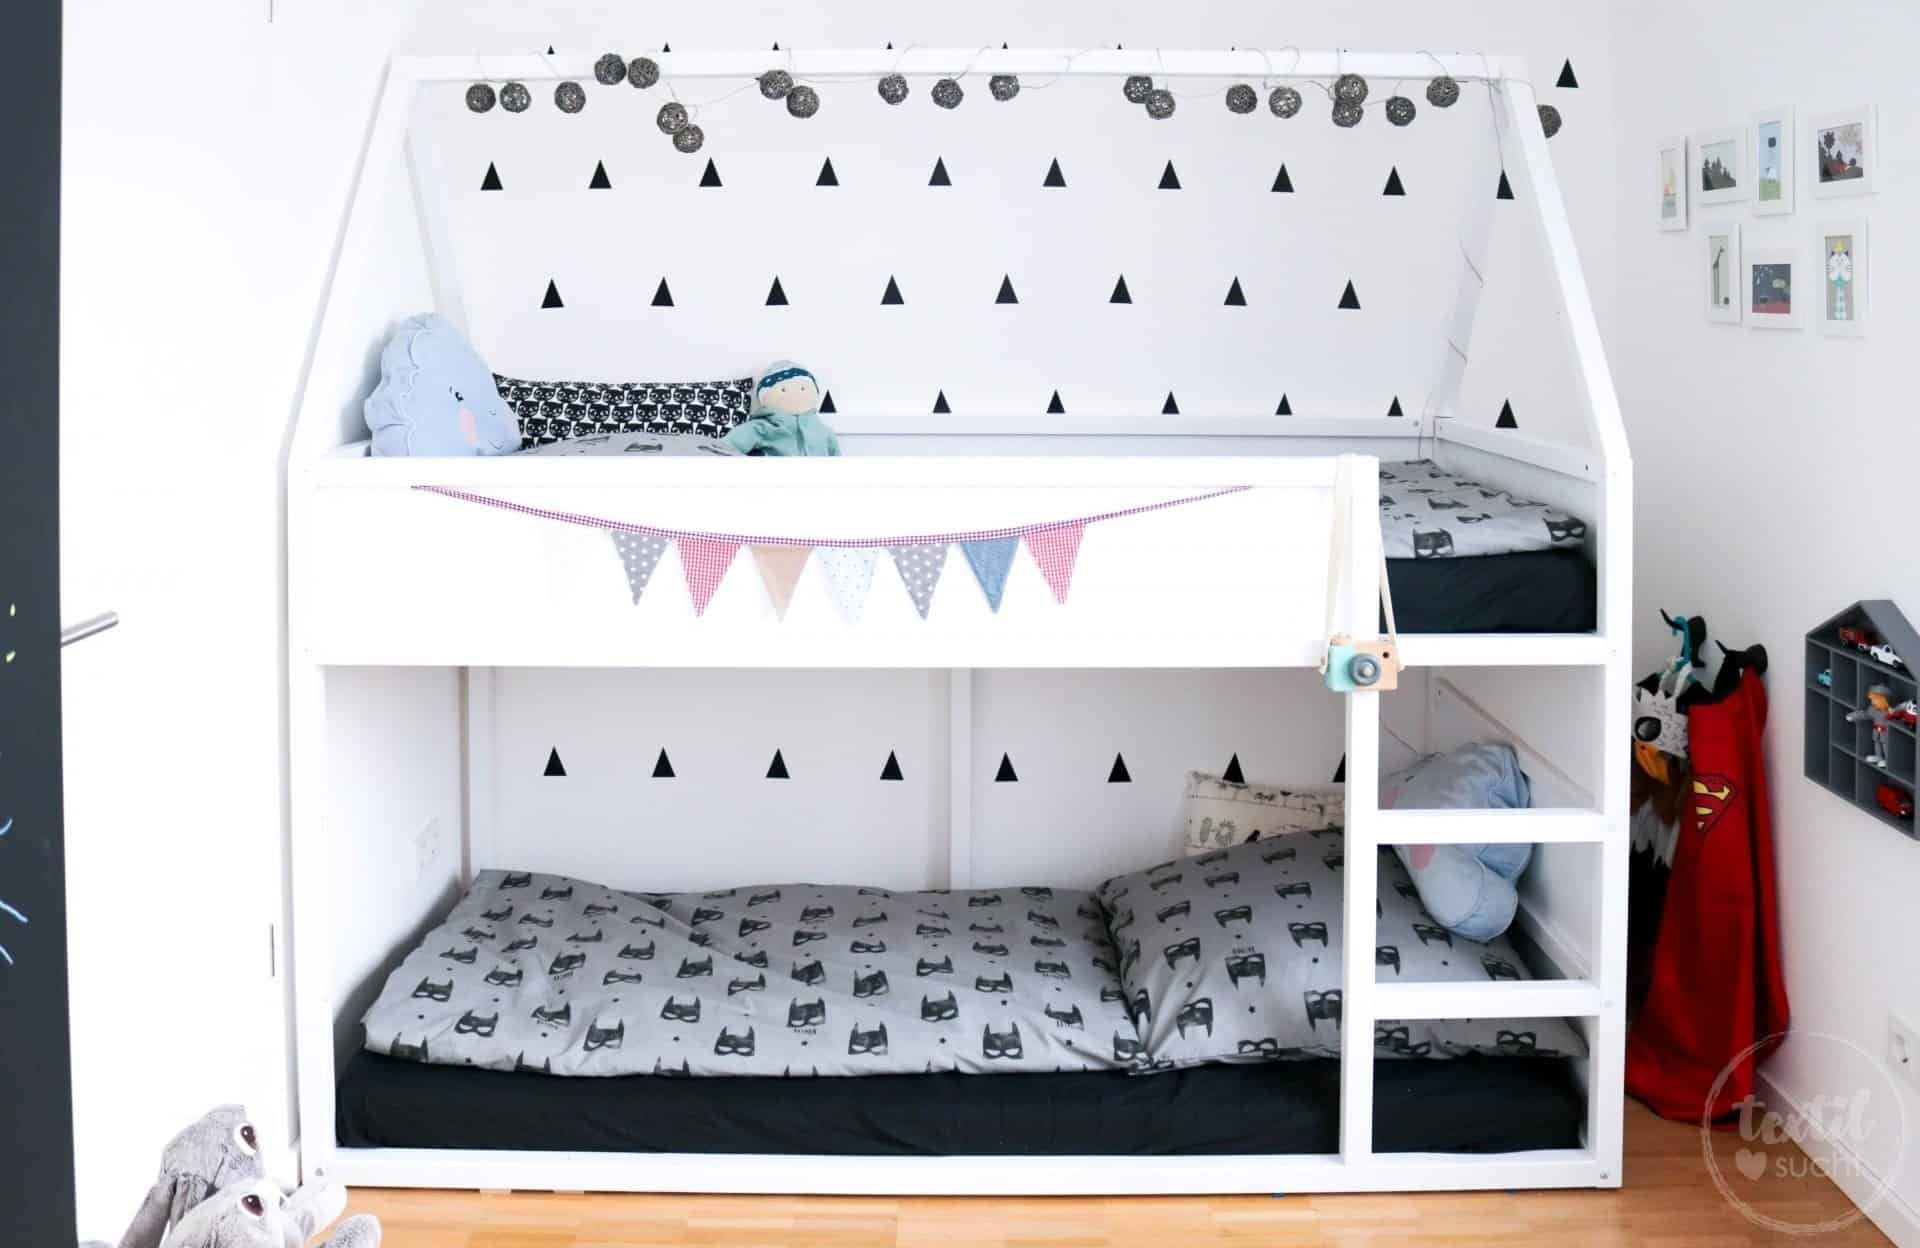 Ikea Etagenbett Kura : Ikeahochbett kura matratze nachttisch kaufen auf ricardo